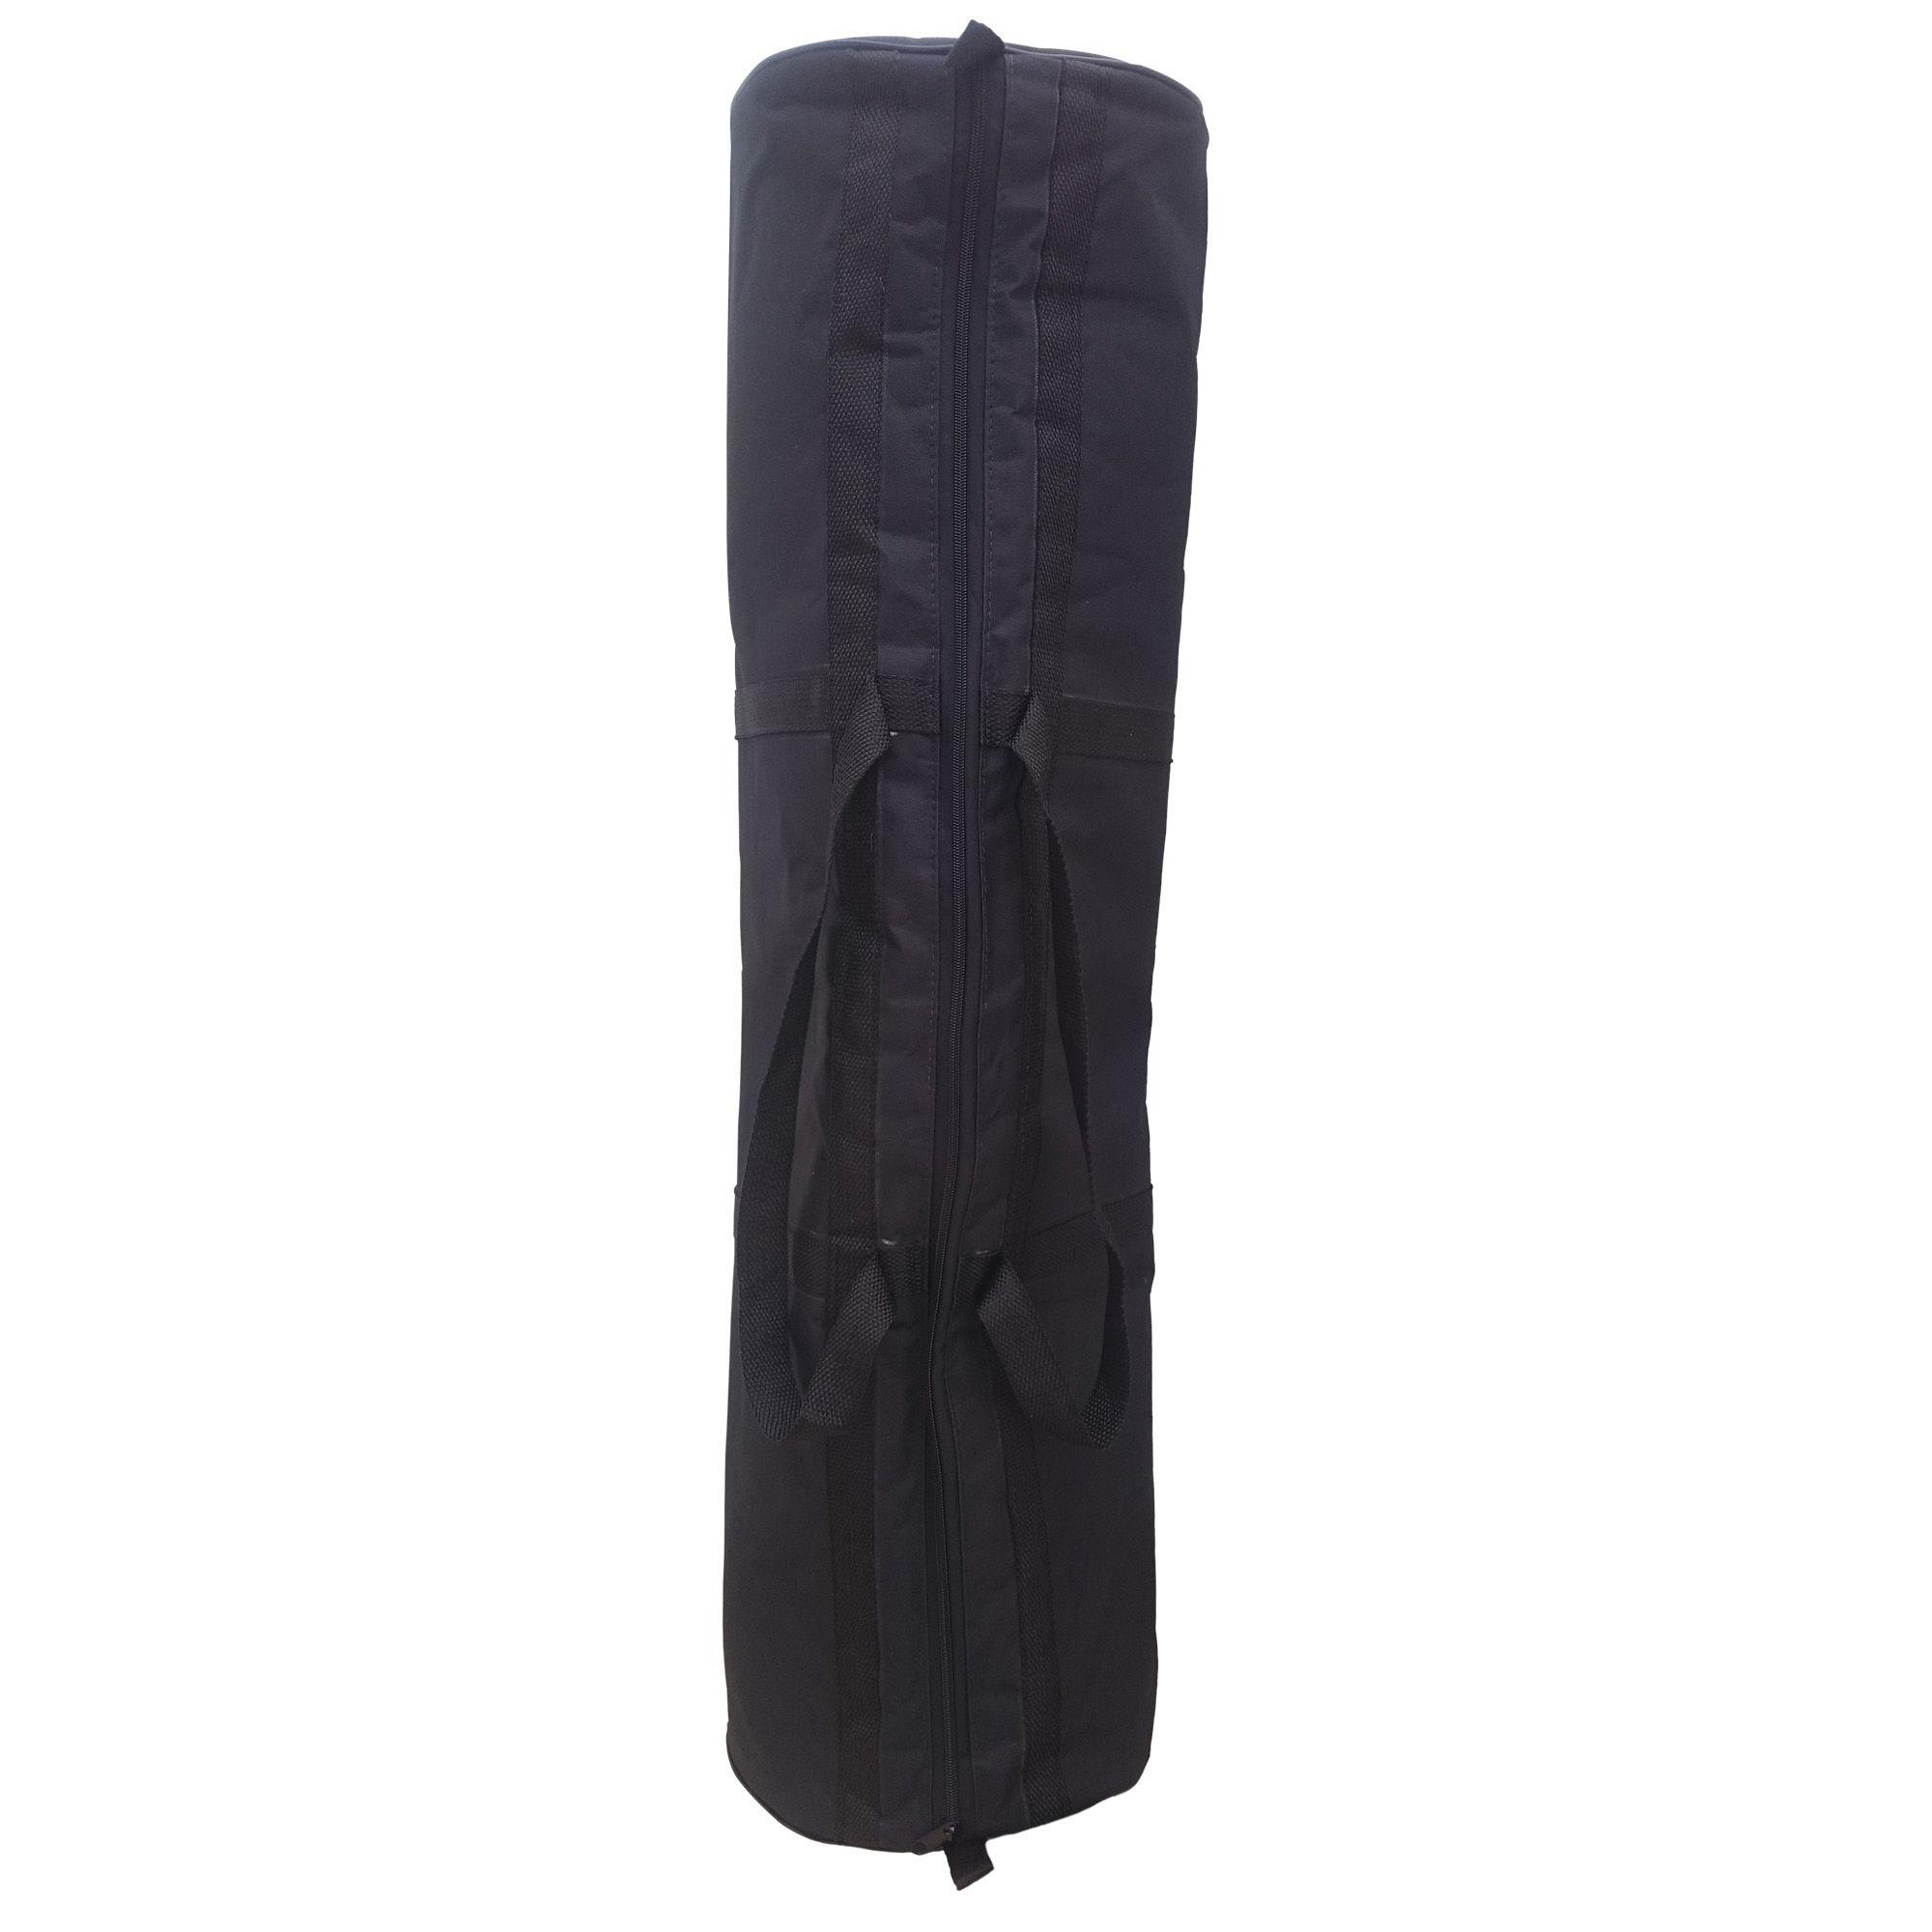 Capa Bag Extra Luxo, Clave & Bag,  De 102 cm x 25 cm Acolchoada, P/ Ferragens De Bateria.